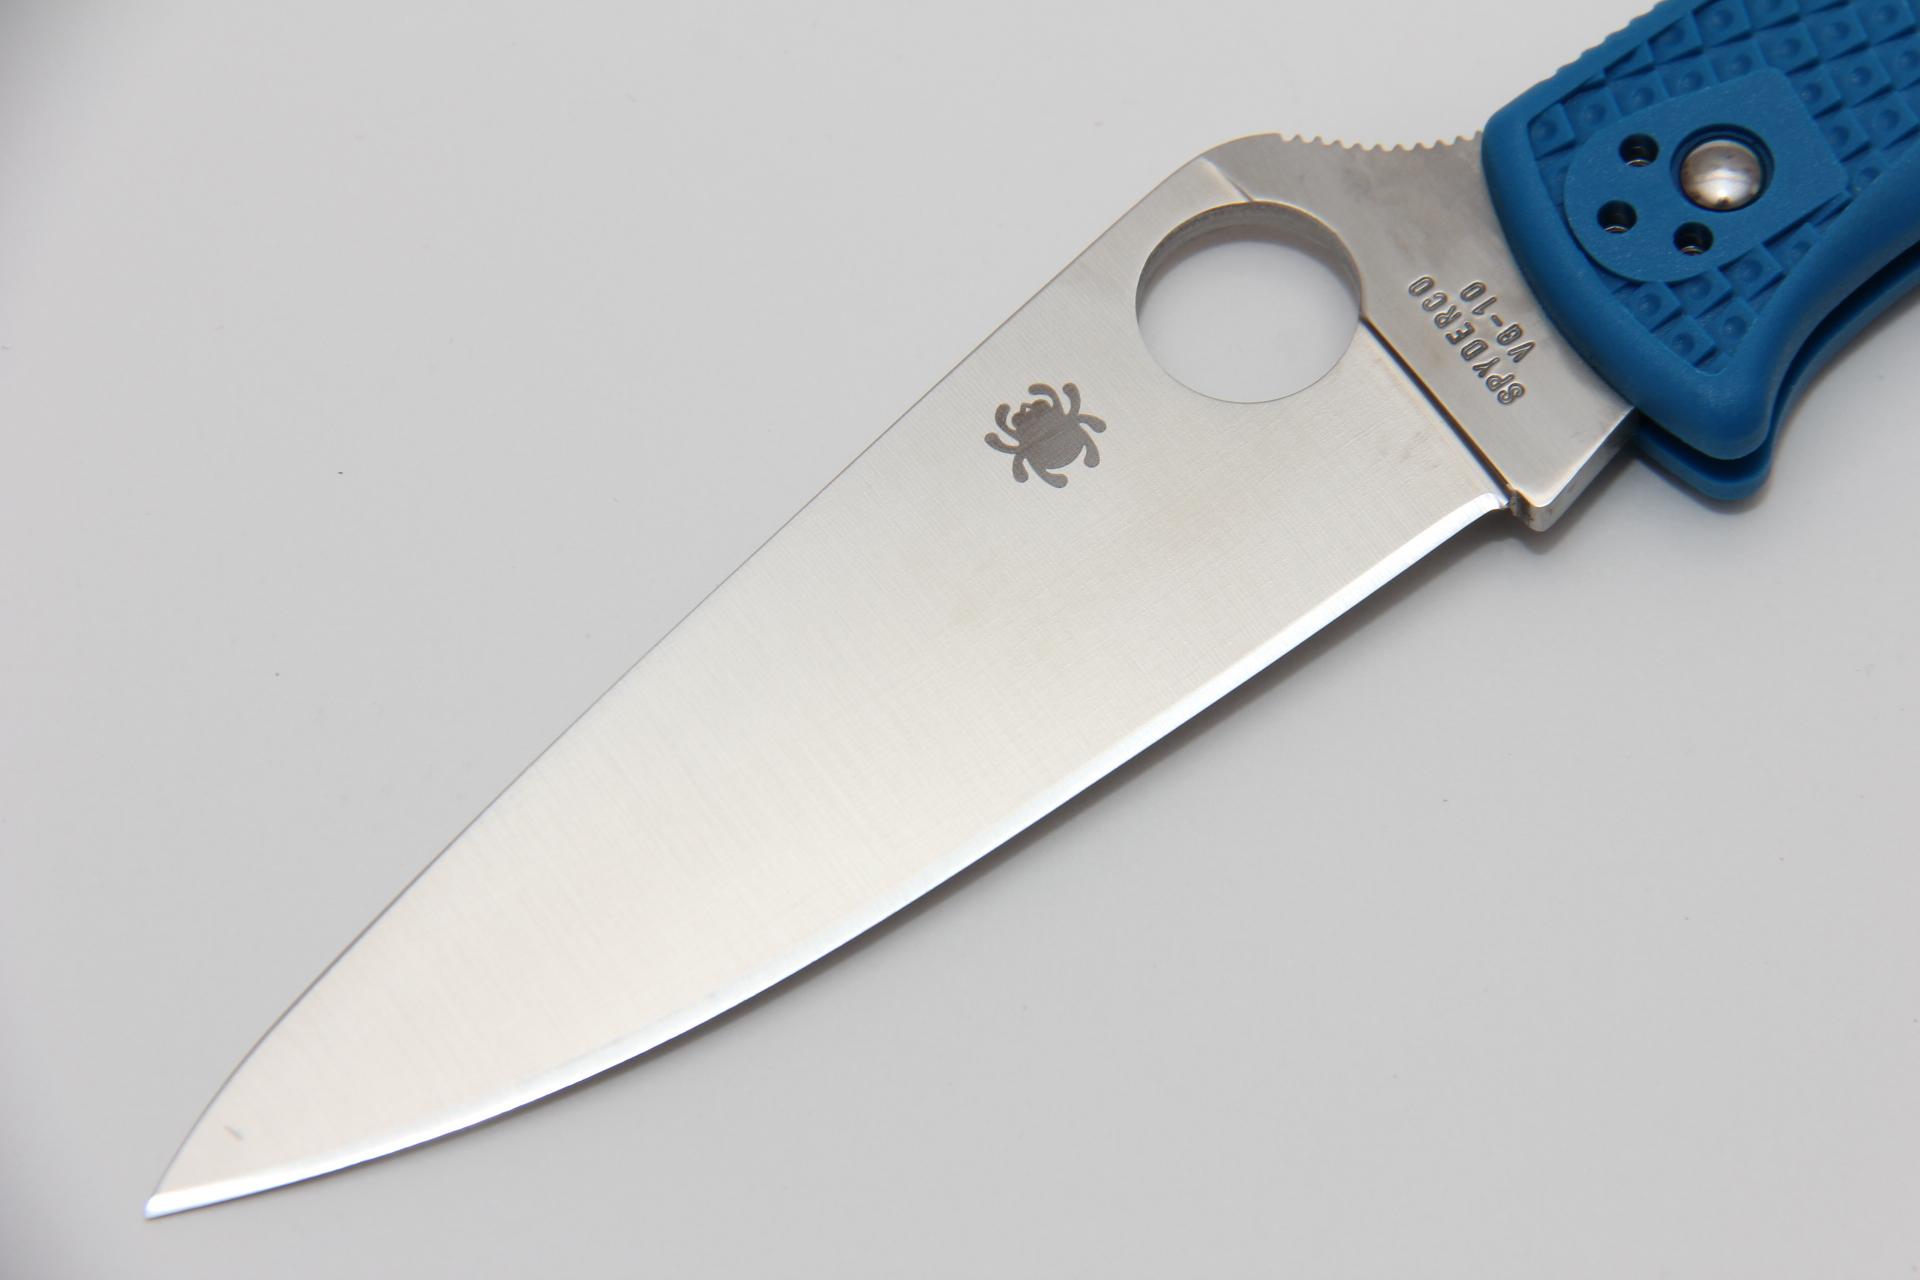 Нож Spyderco Endura Blue SC10FPBL